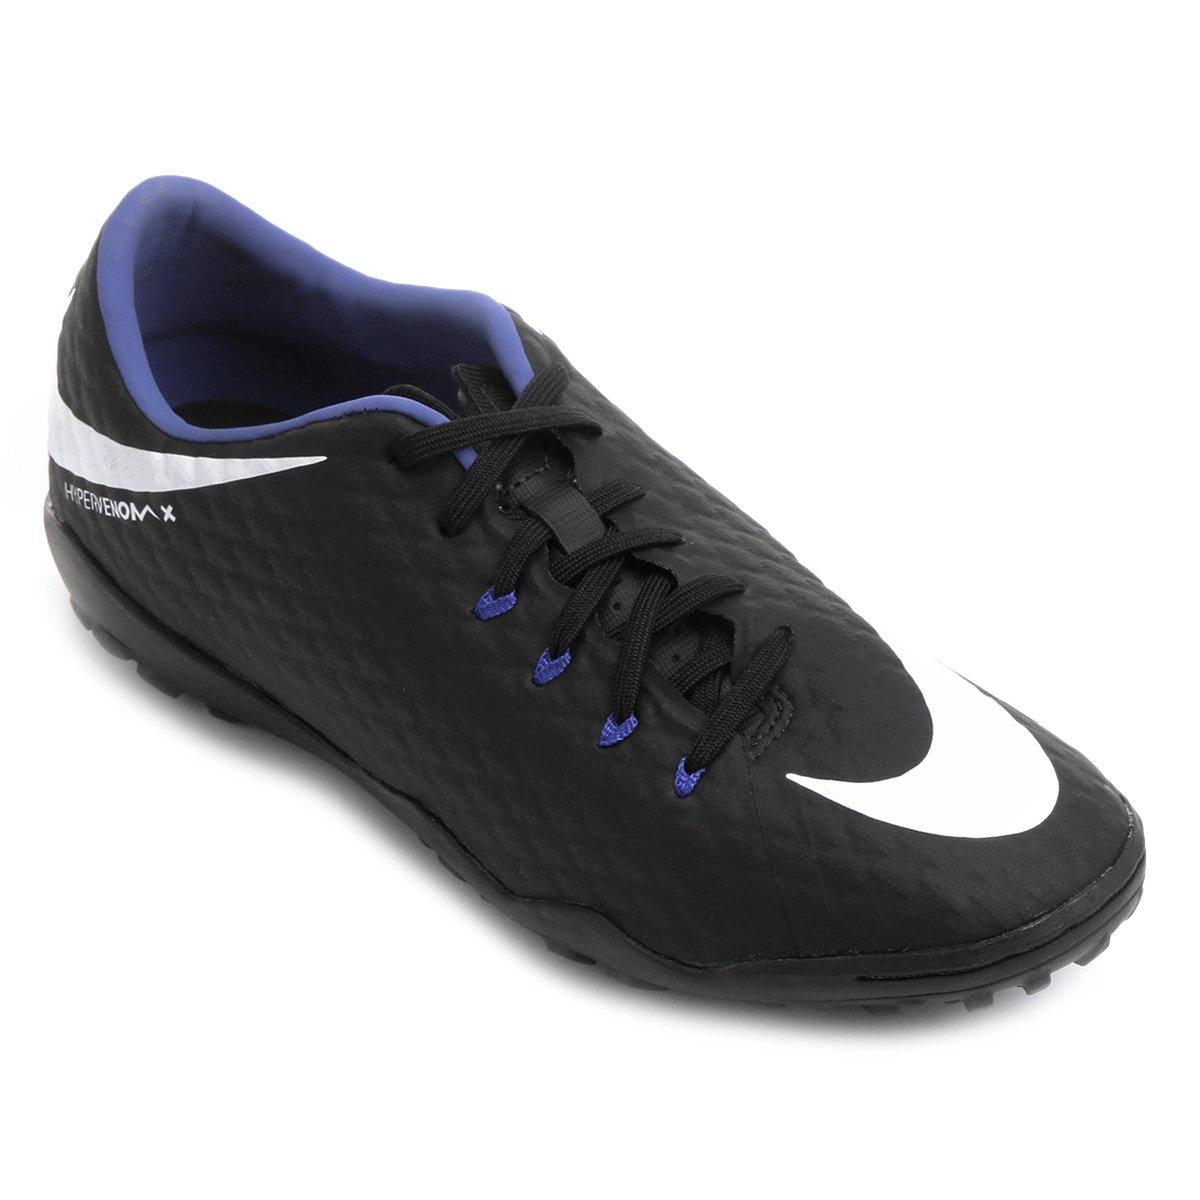 485dadc77b Chuteira Society Nike Hypervenom Phelon 3 TF - Preto e Lilás ...